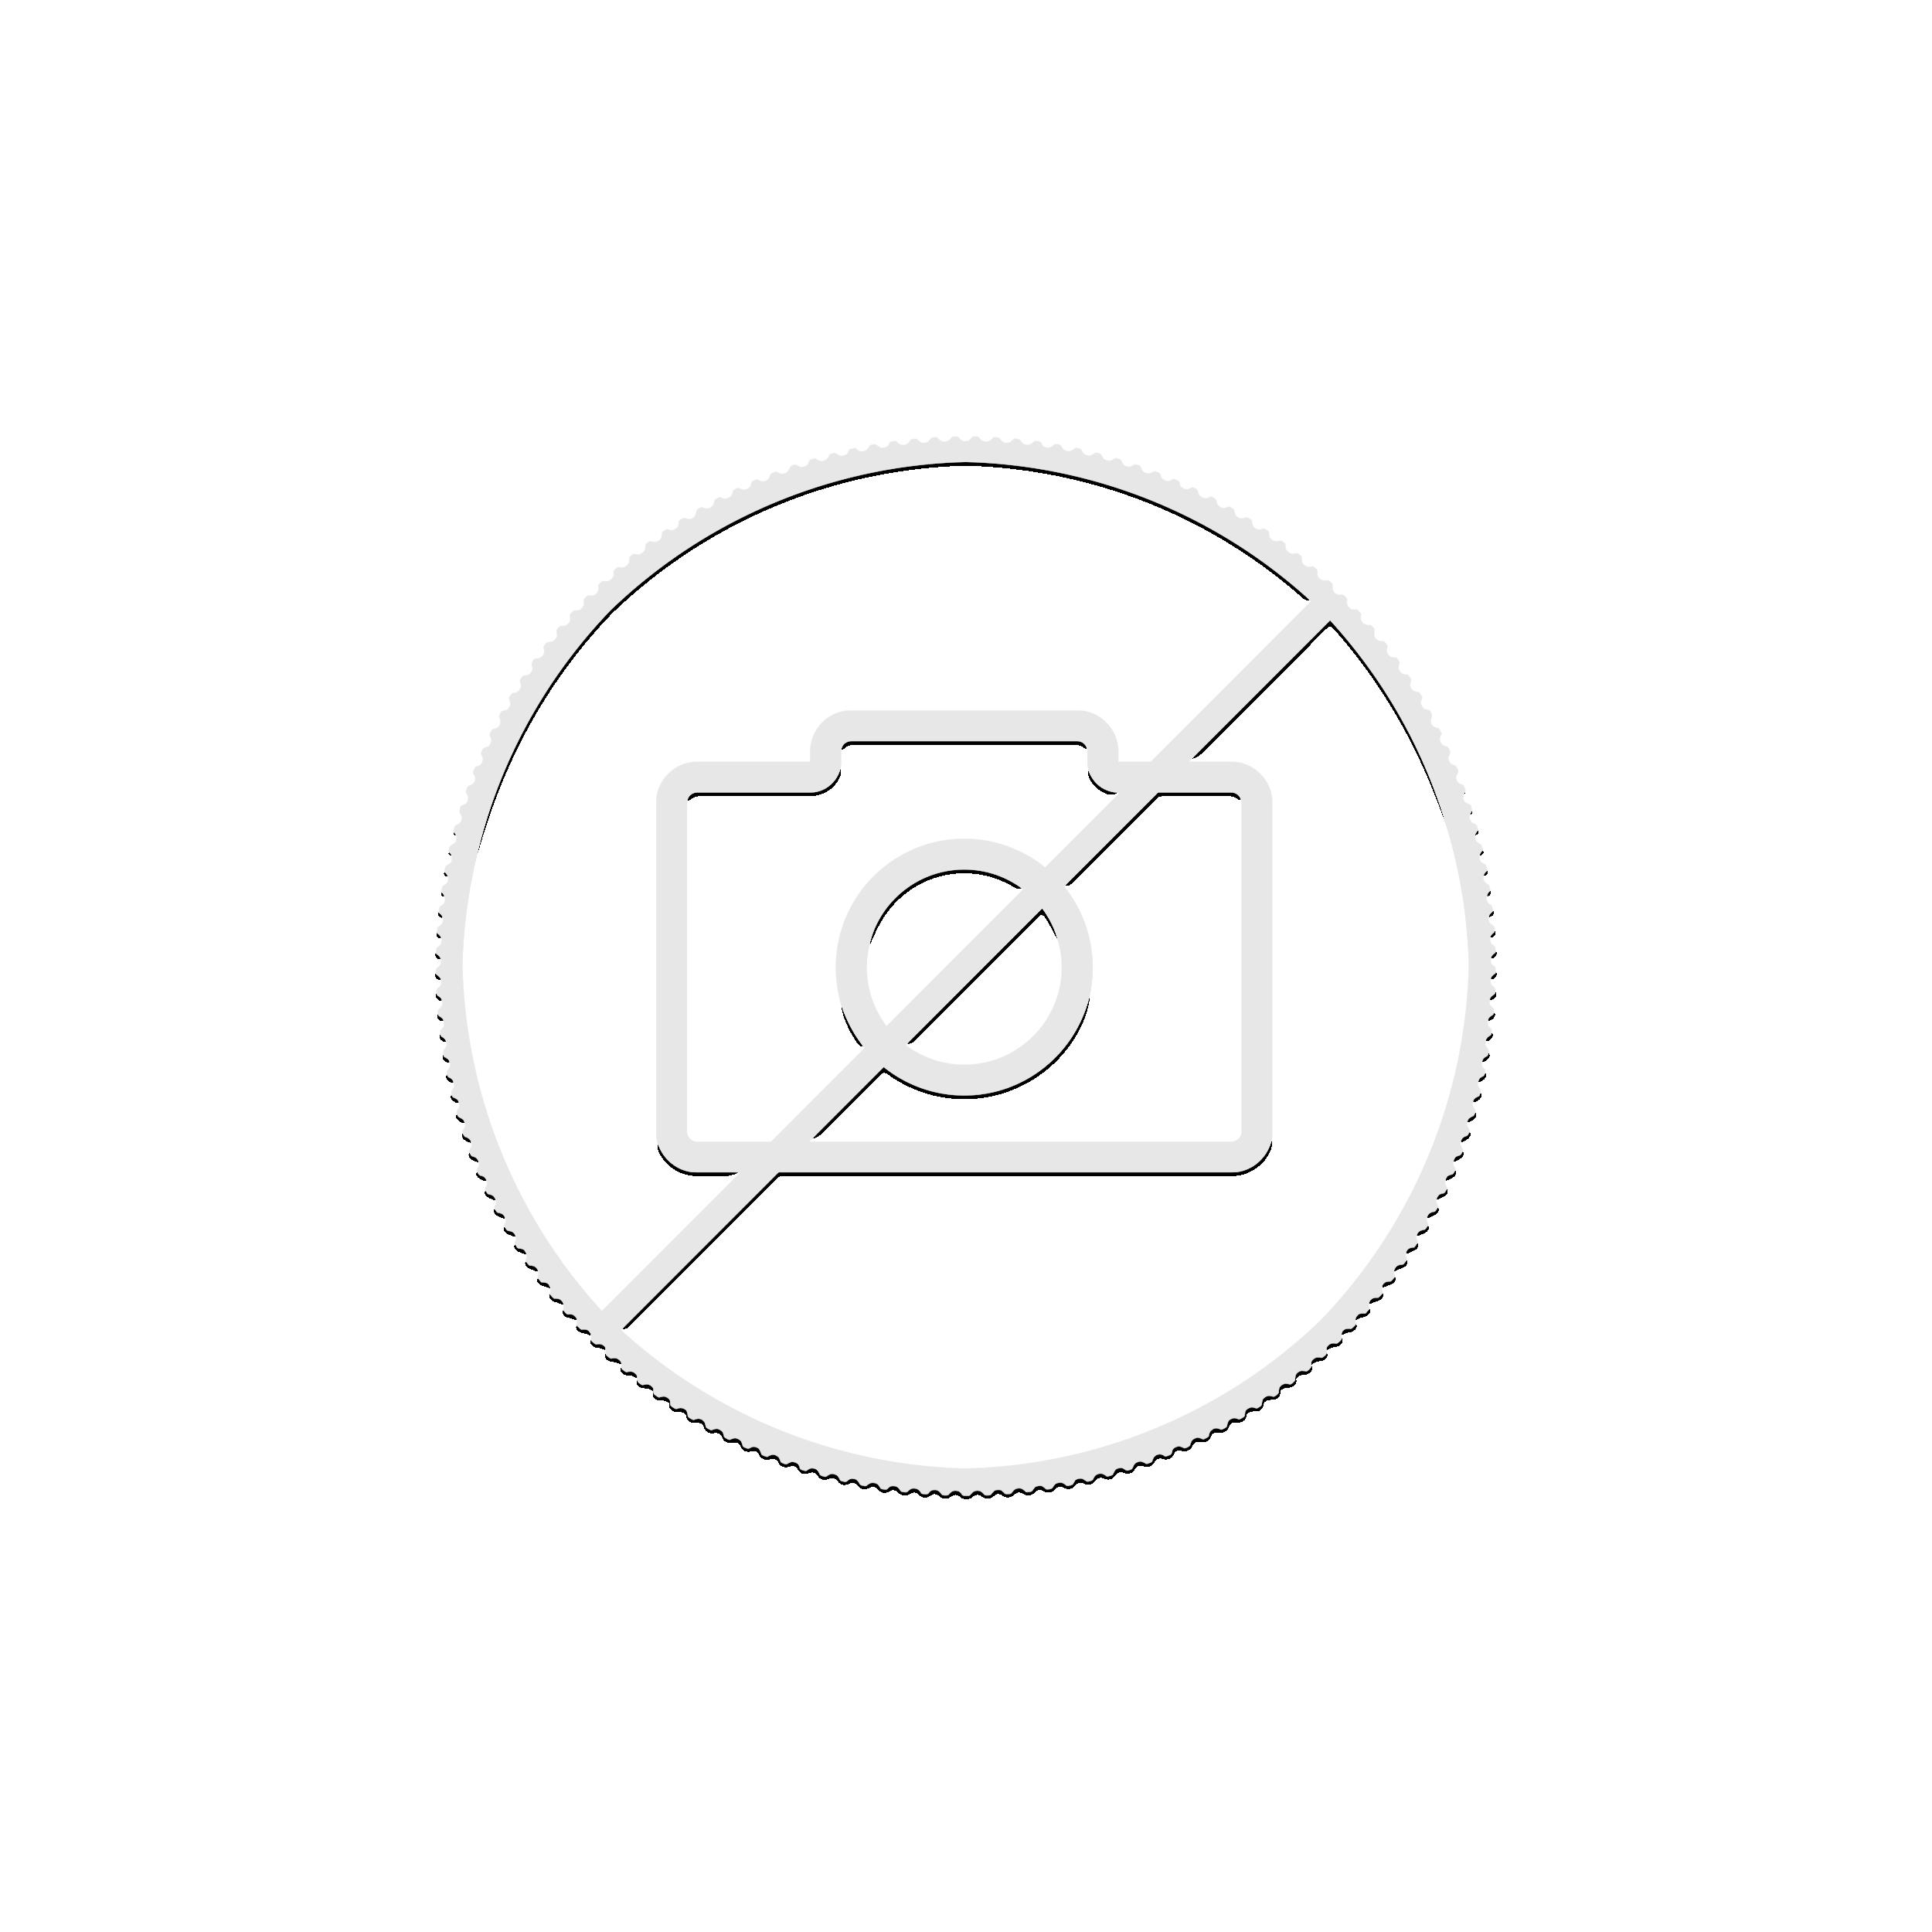 1/2 troy ounce gouden Maple Leaf munt 2019